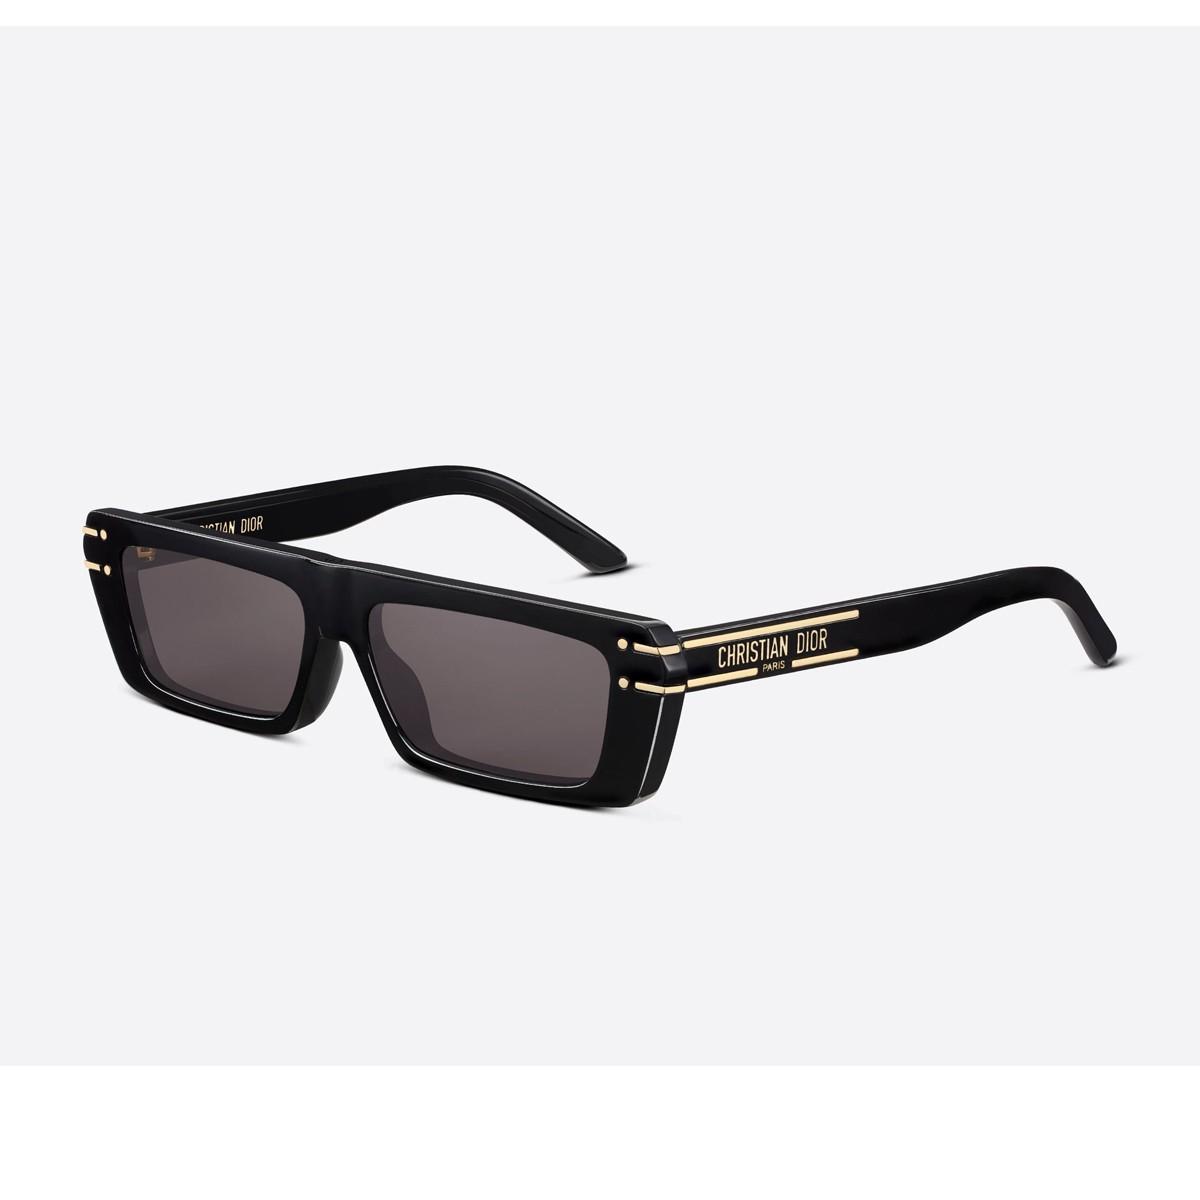 DIORSIGNATURE S2U | Women's sunglasses